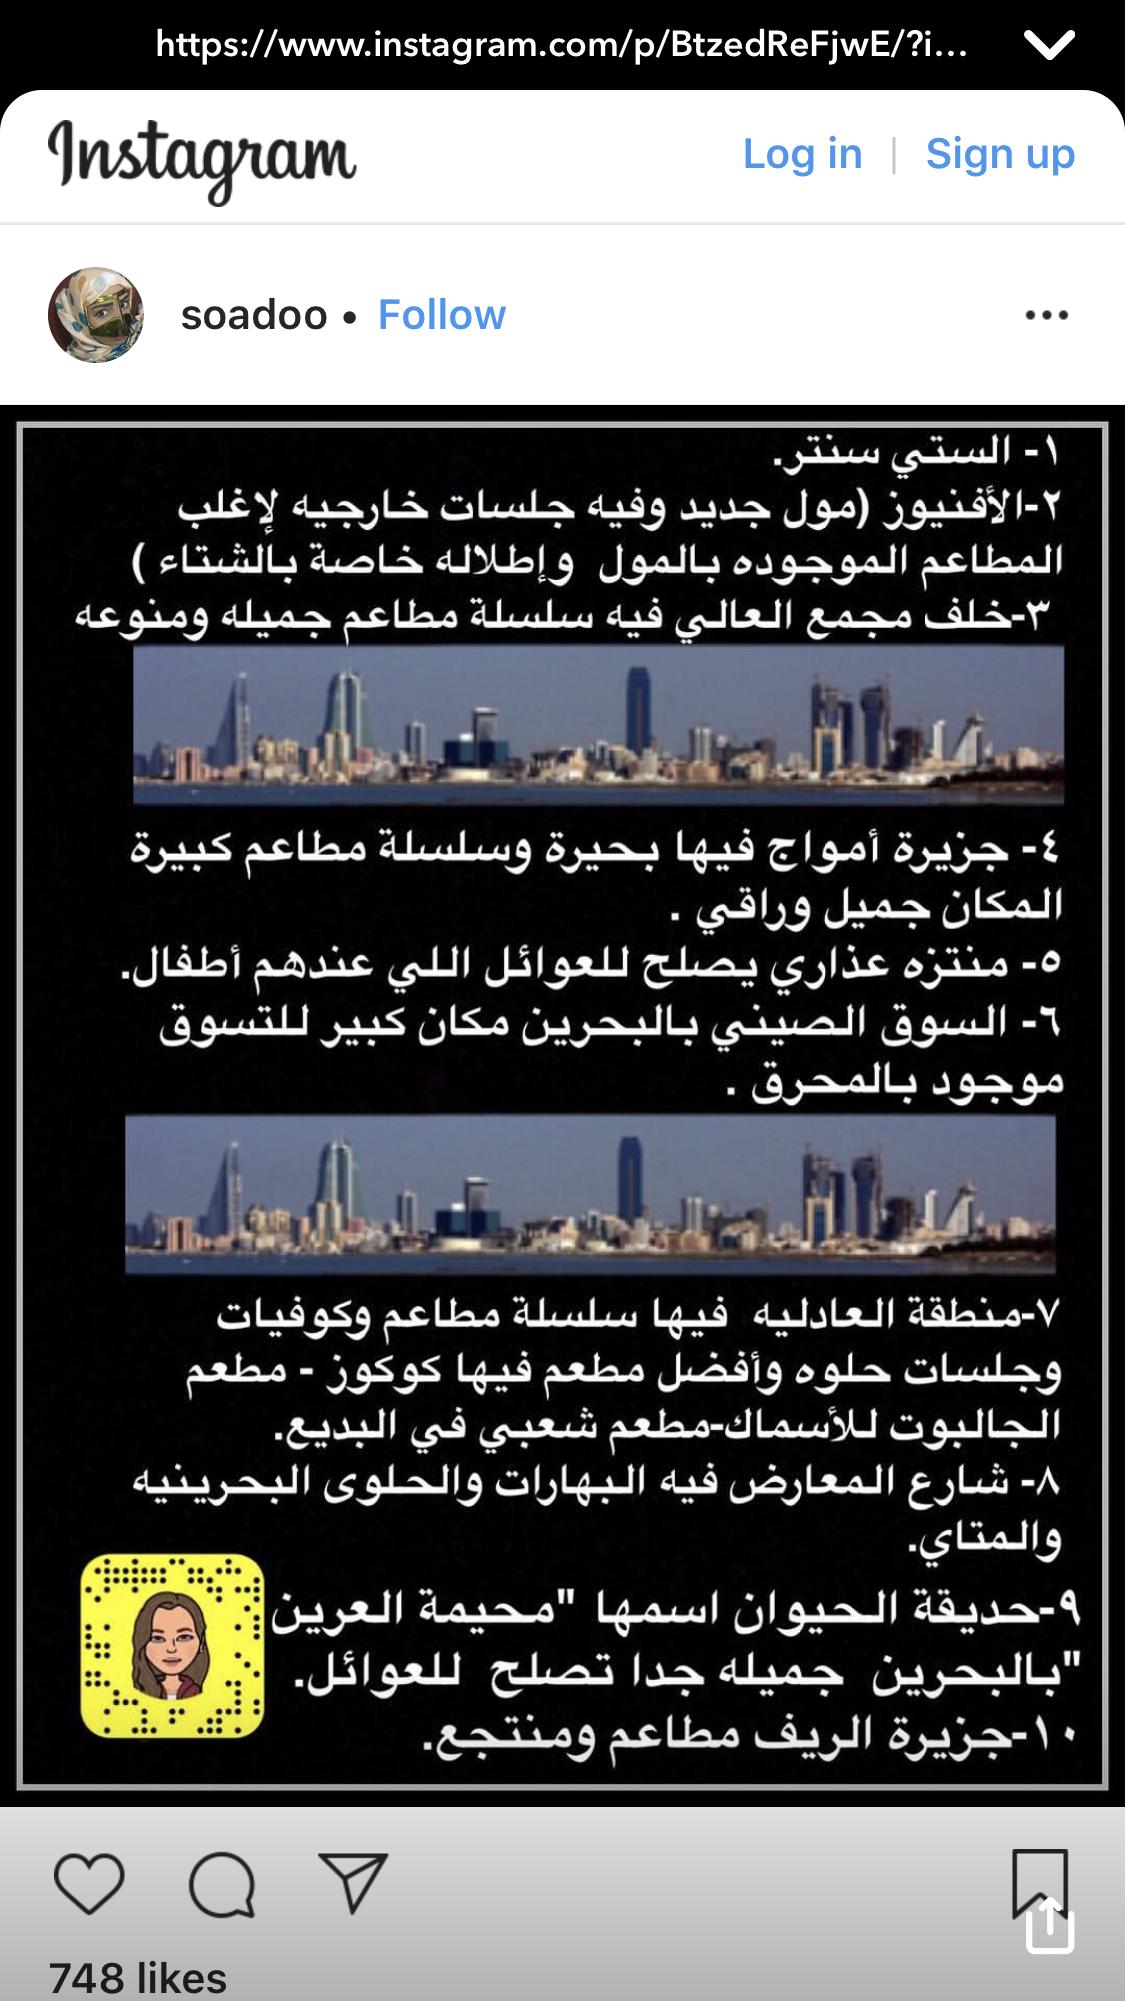 أماكن بالبحرين سناب سعاد Instagram Periodic Table Signs